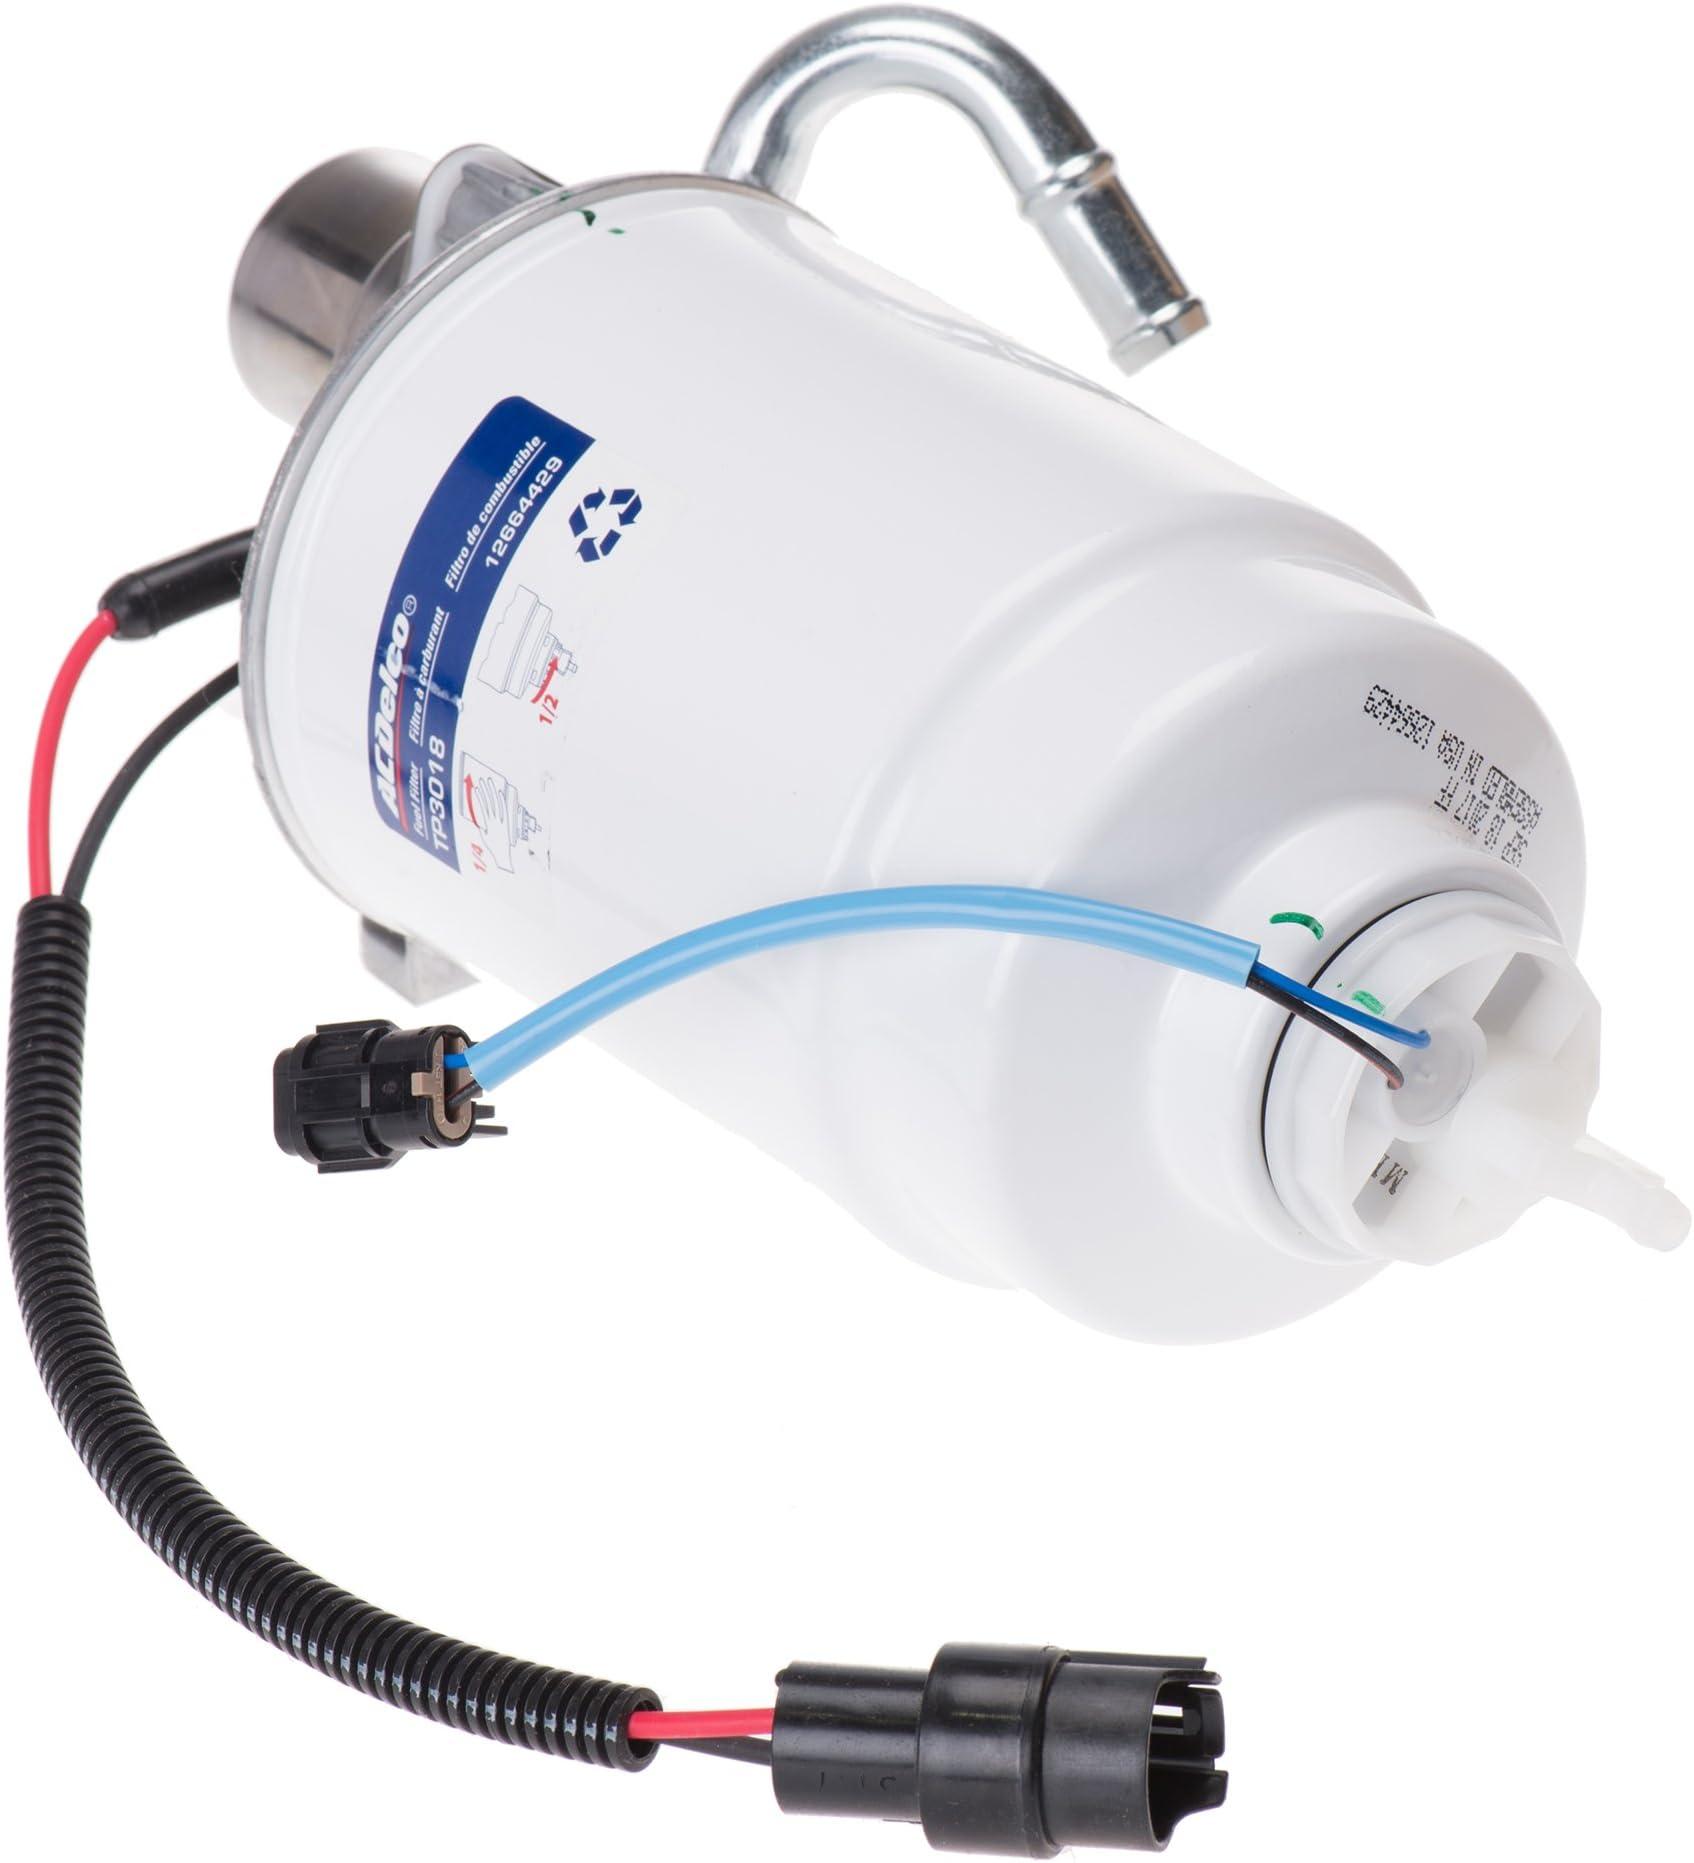 OEM NEW 6.6L Duramax Diesel Fuel Filter Housing 05-12 Silverado Sierra  12642623: Automotive - Amazon.comAmazon.com